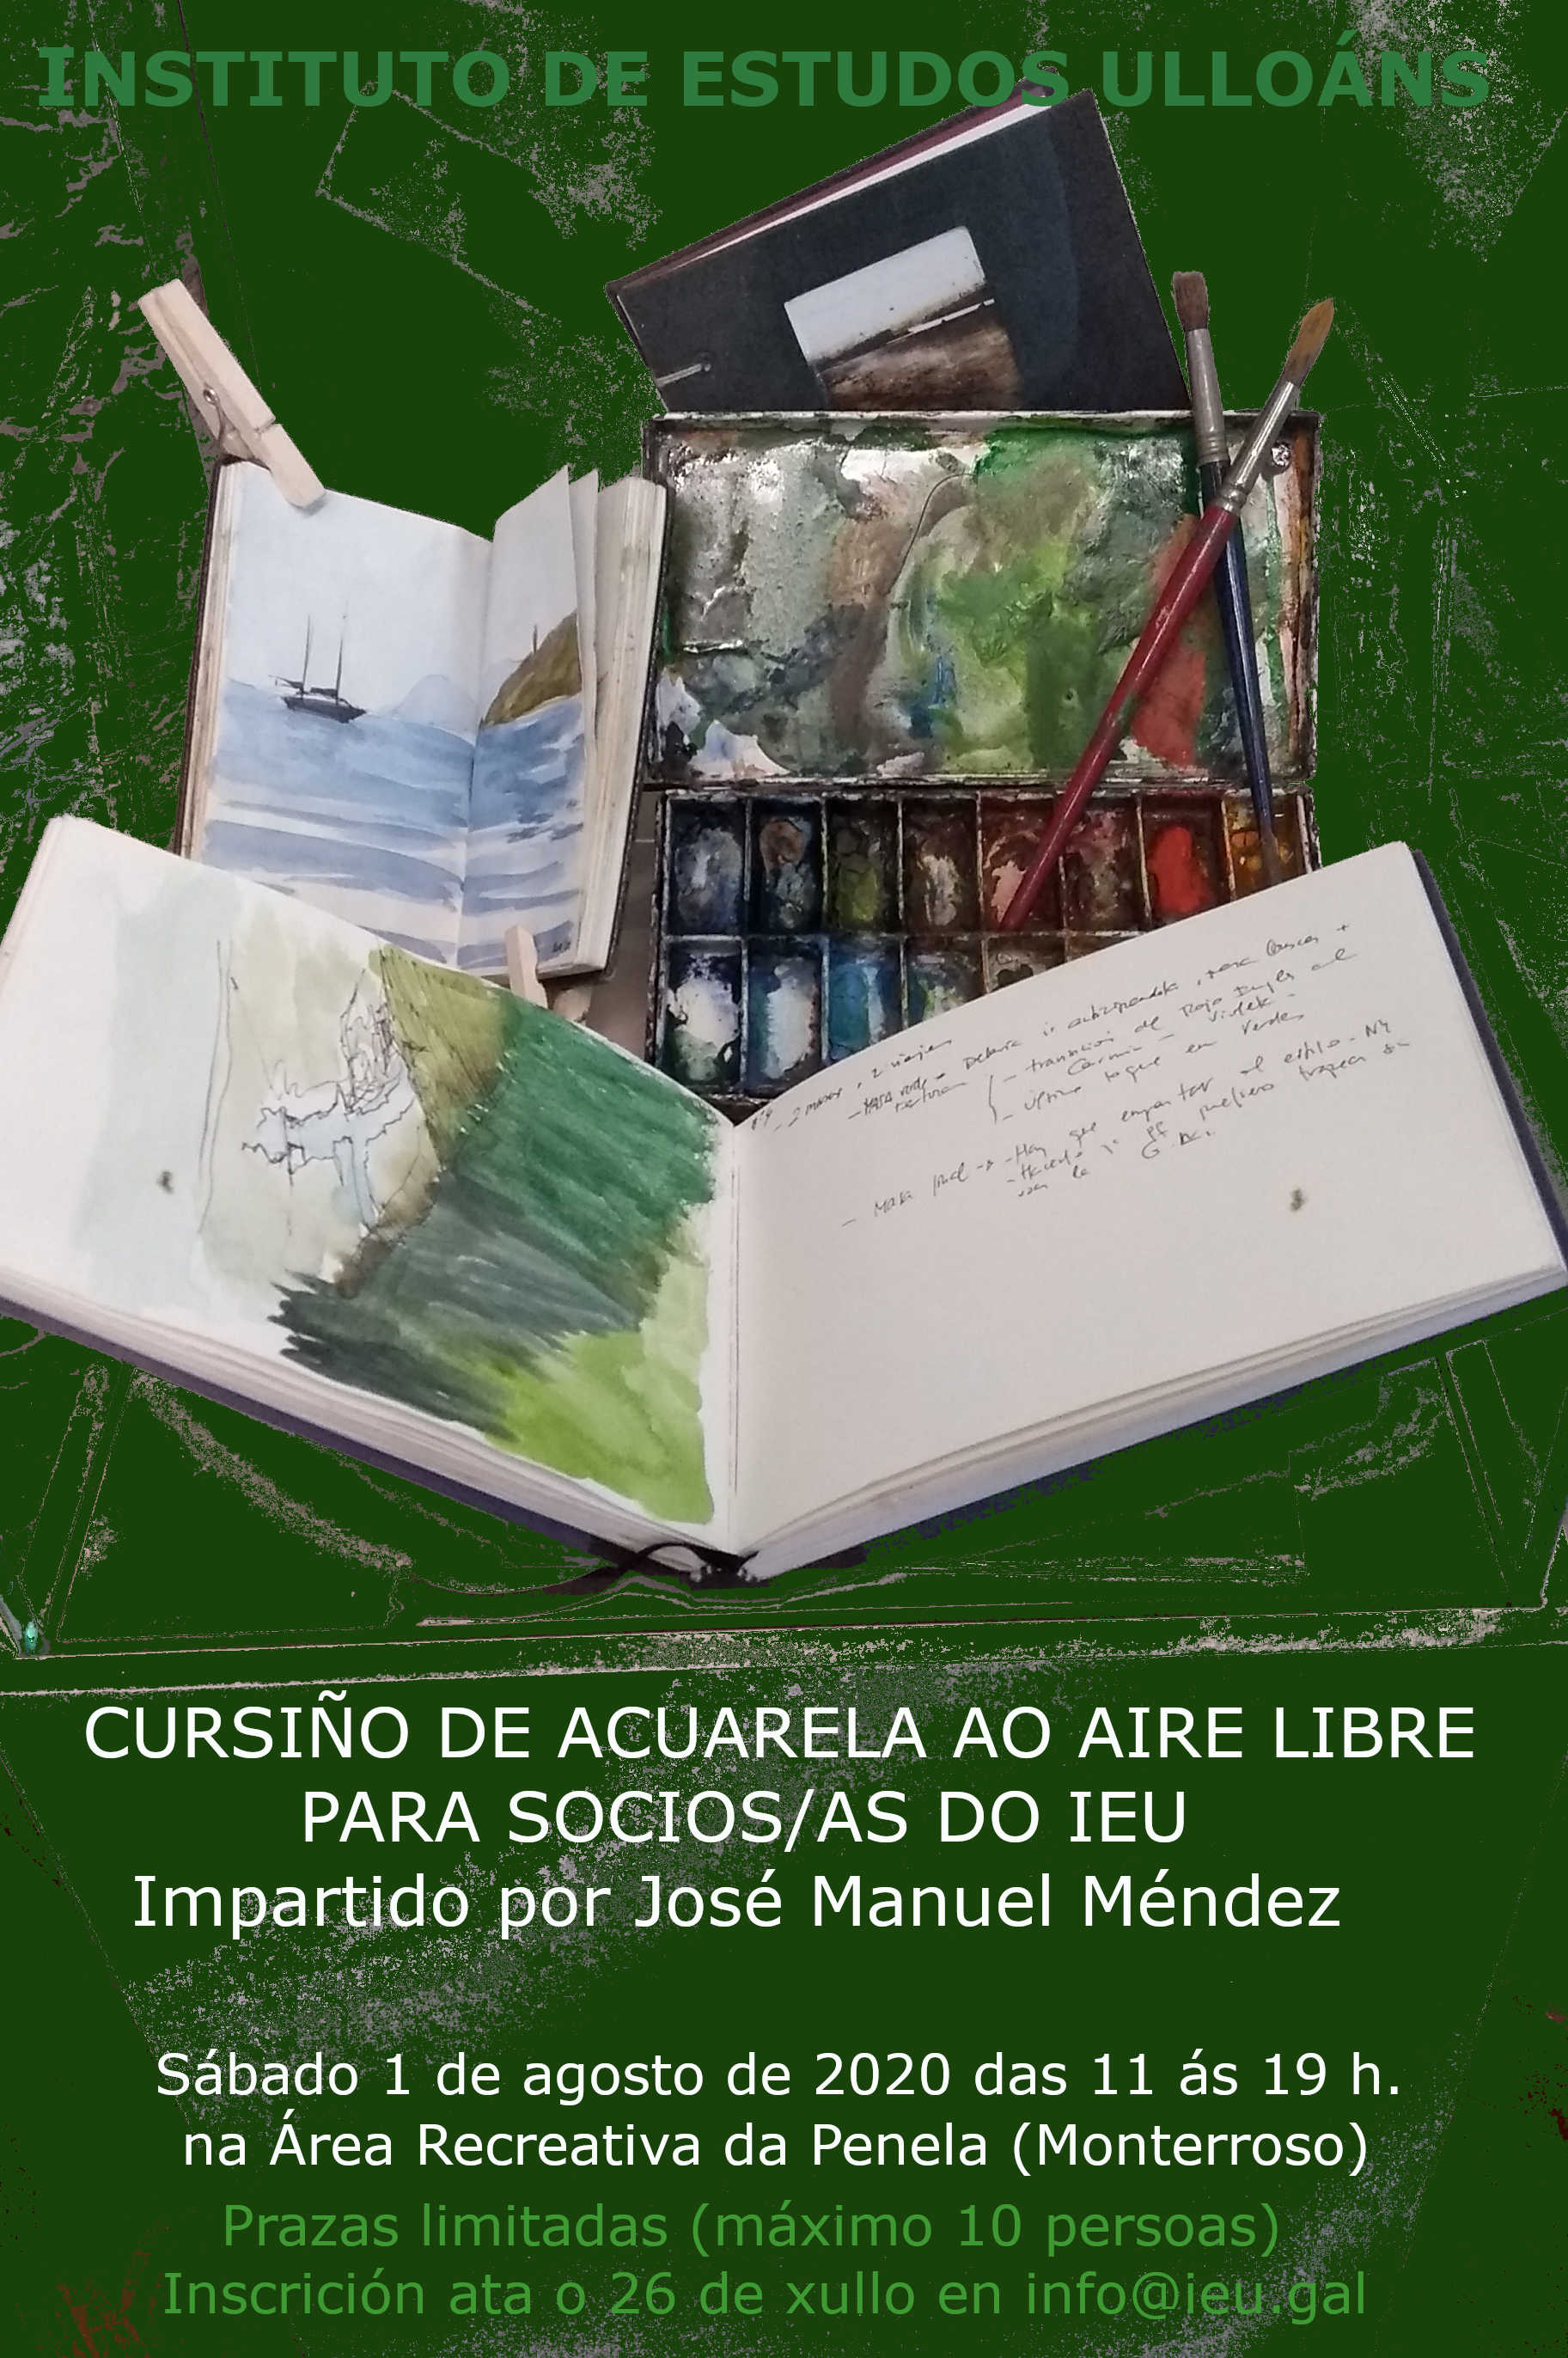 cursiño acuarela, J M Méndez, Instituto de Estudos Ulloáns, Area Recreativa A Peneda, Monterroso